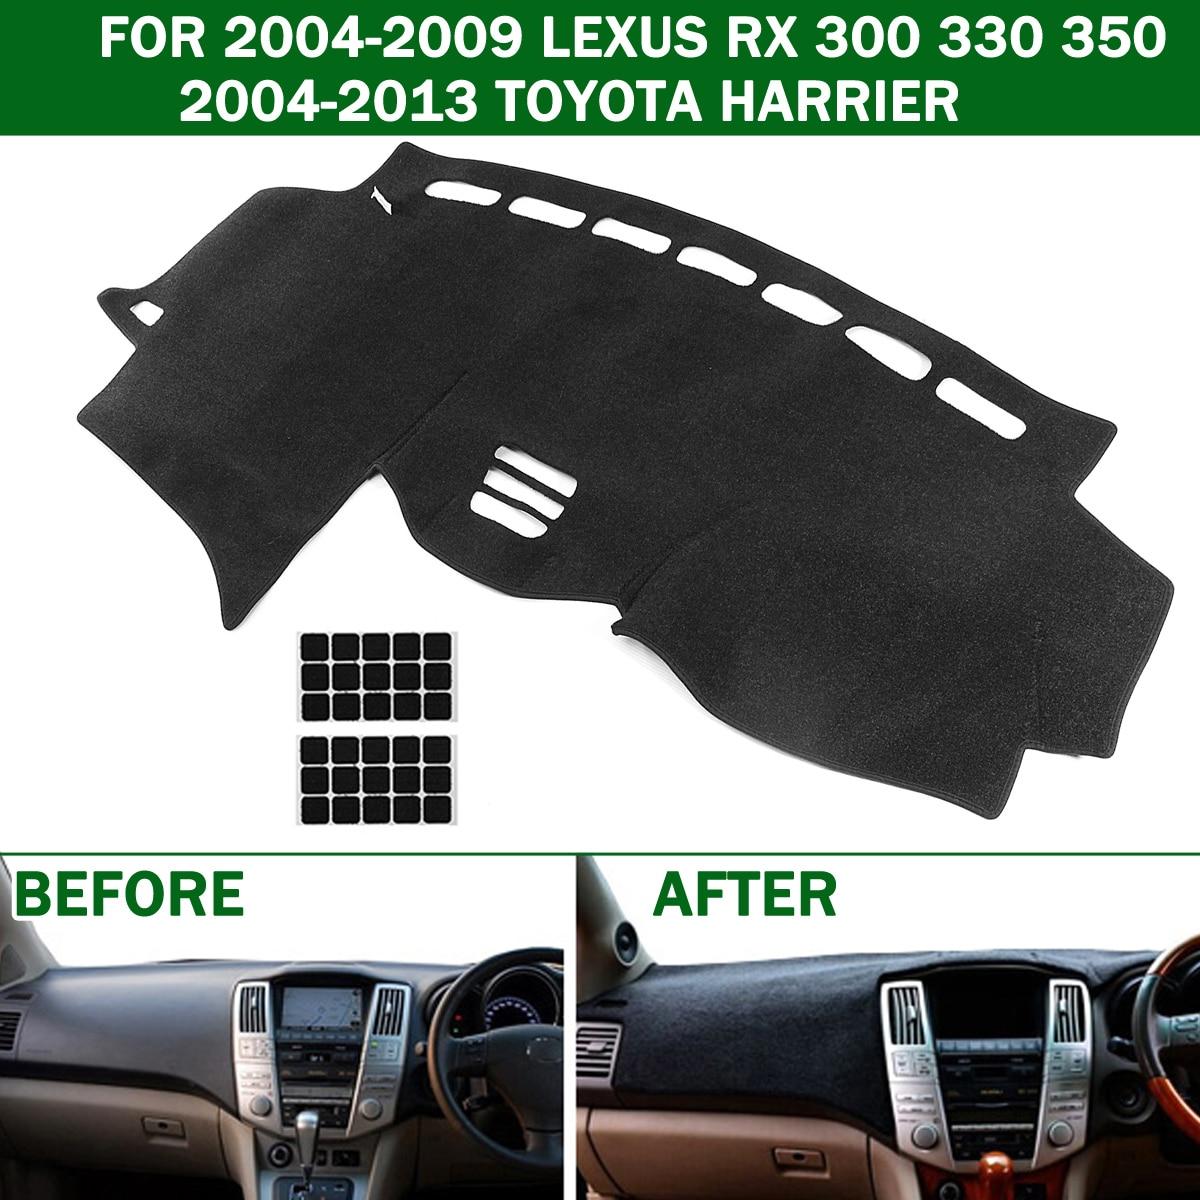 Autoleader dashmat carro painel esteira traço placa capa almofada para lexus rx 300 330 350 2004-2009